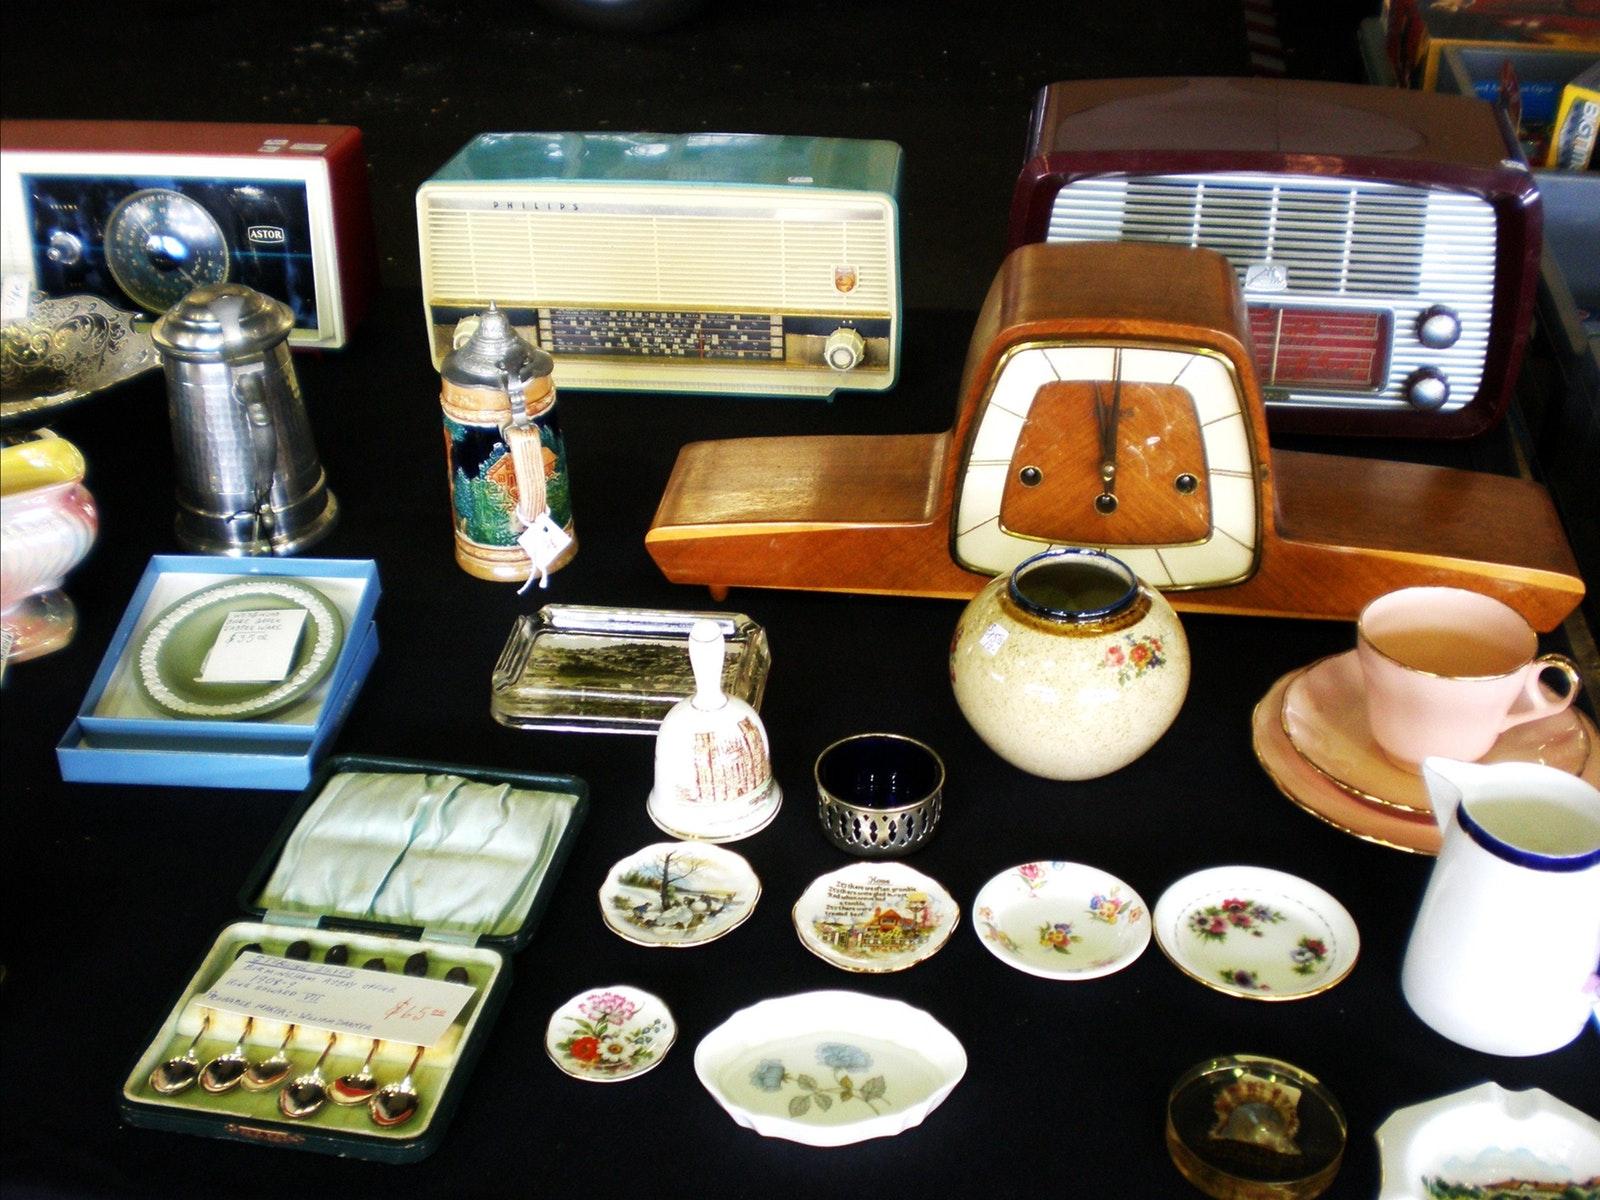 China, clocks, vintage radios